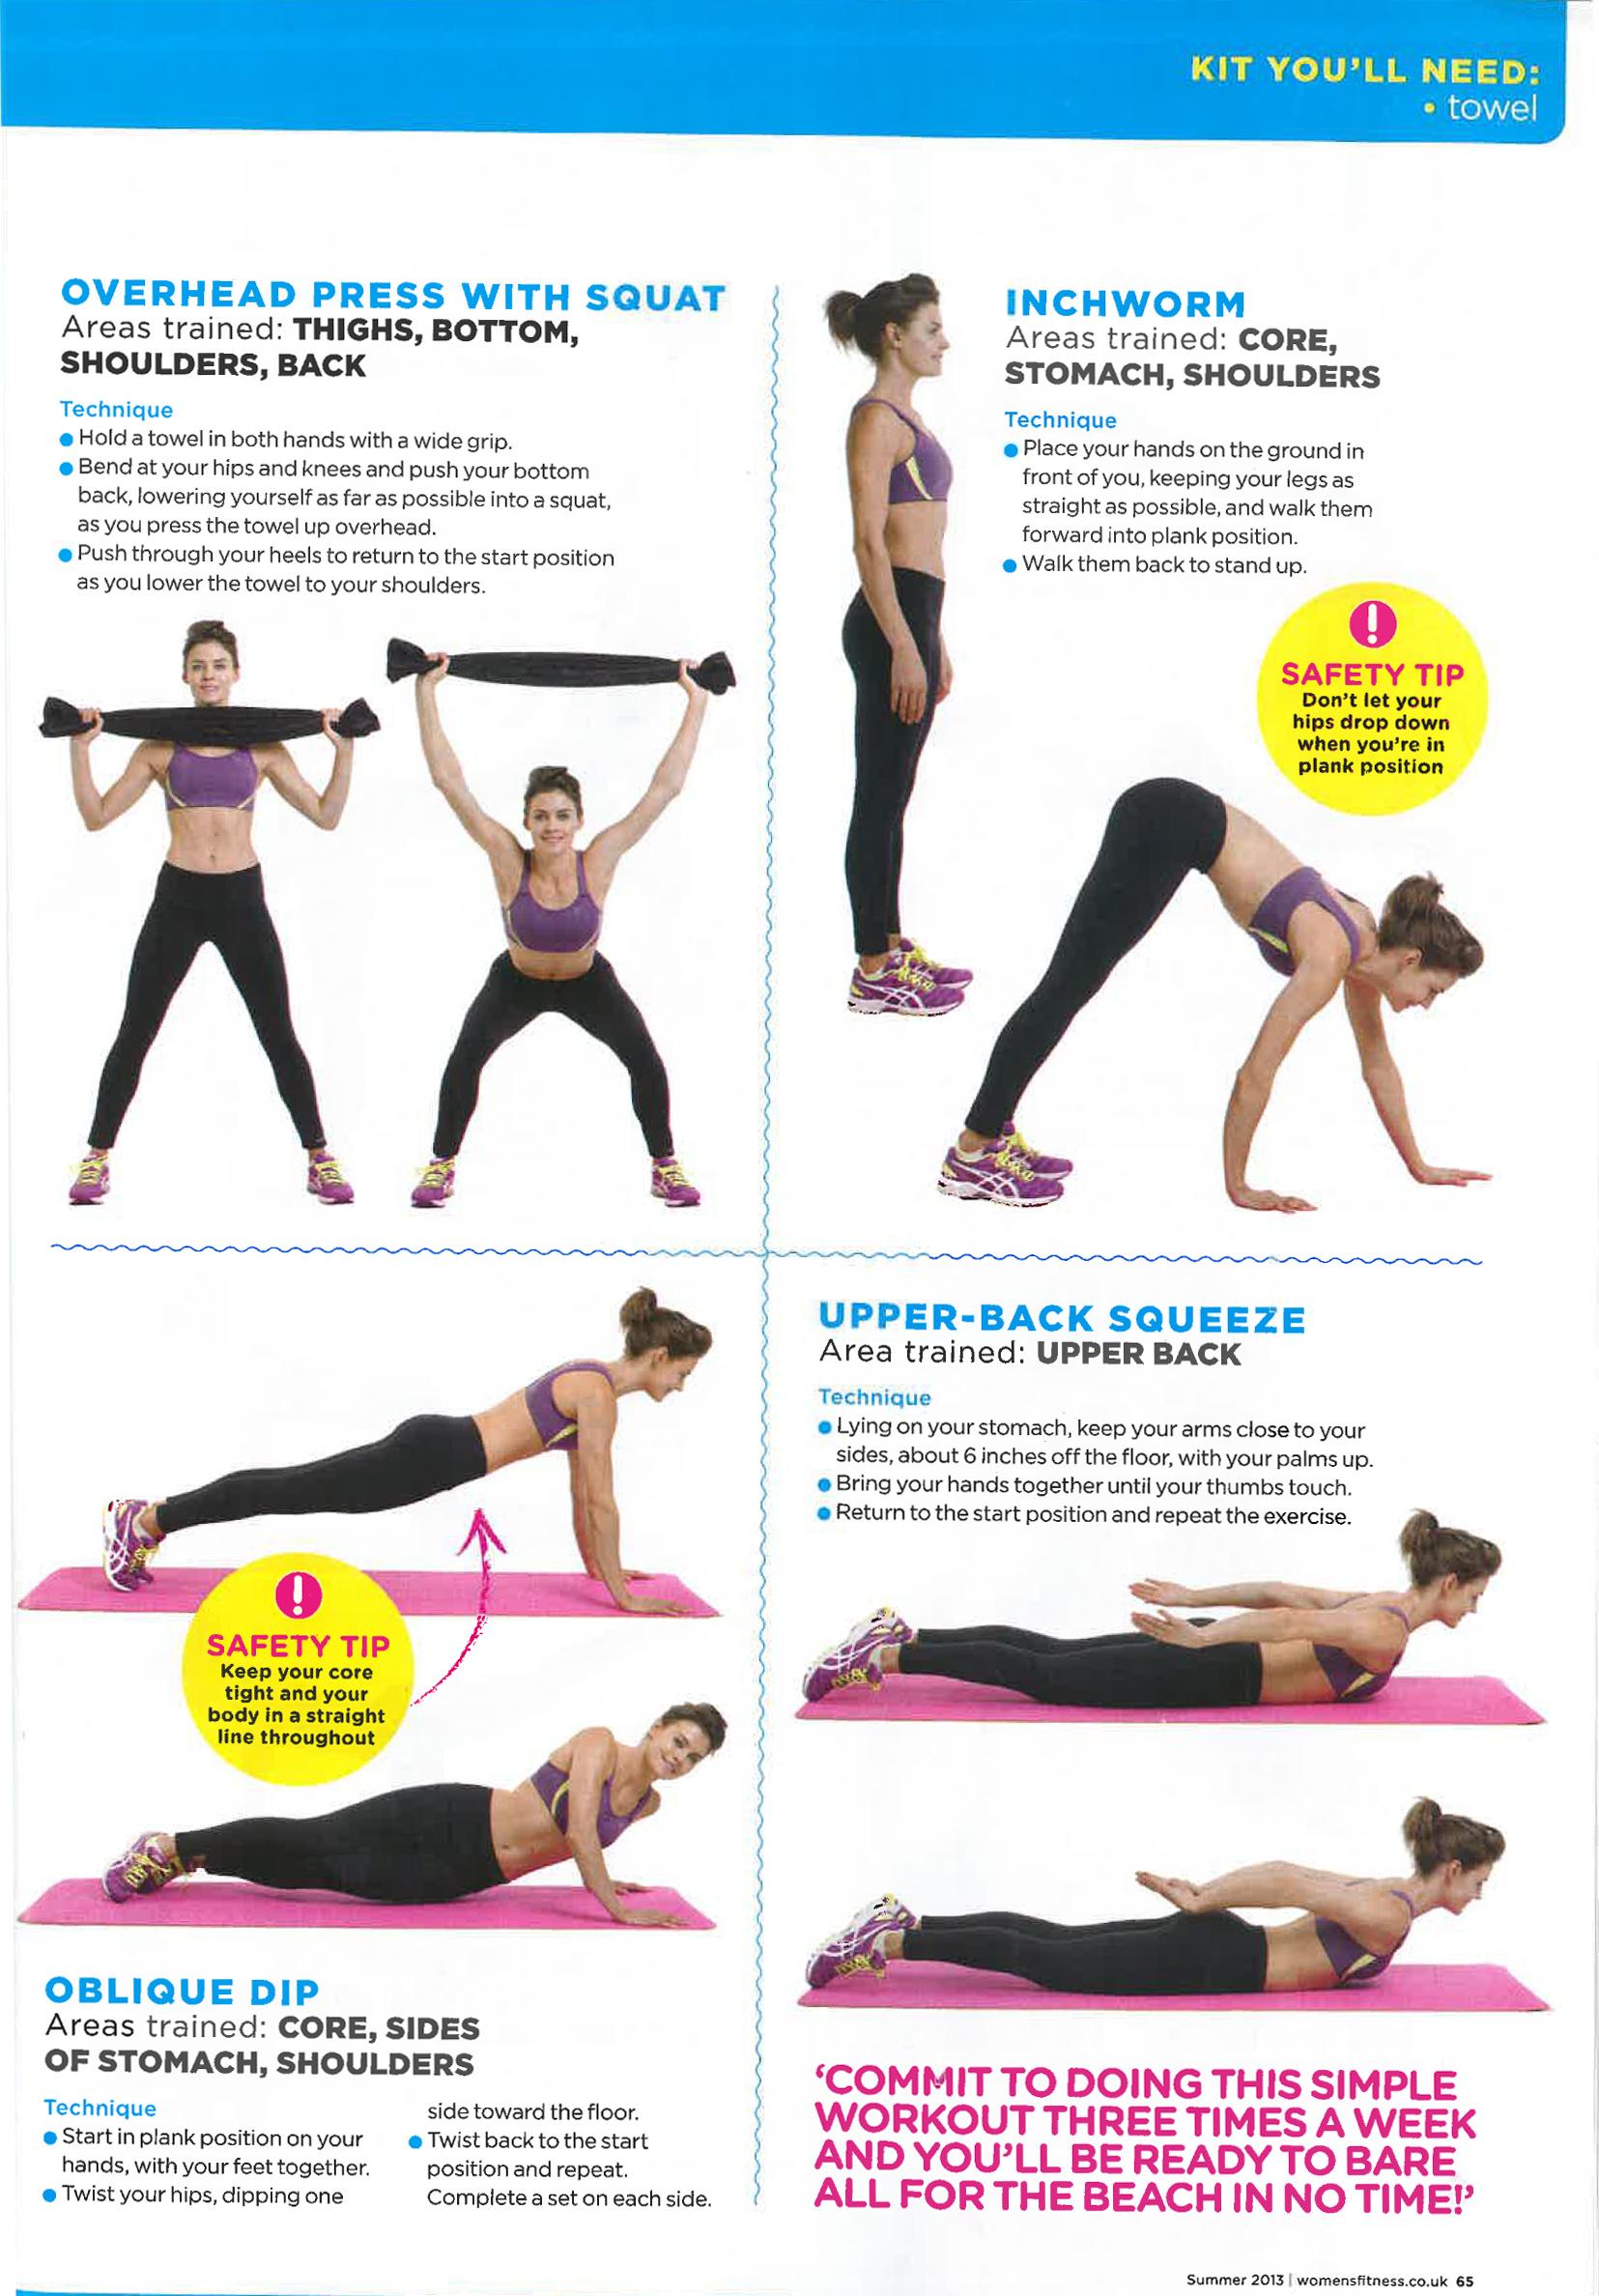 how to get a bikini body fast in 2 weeks